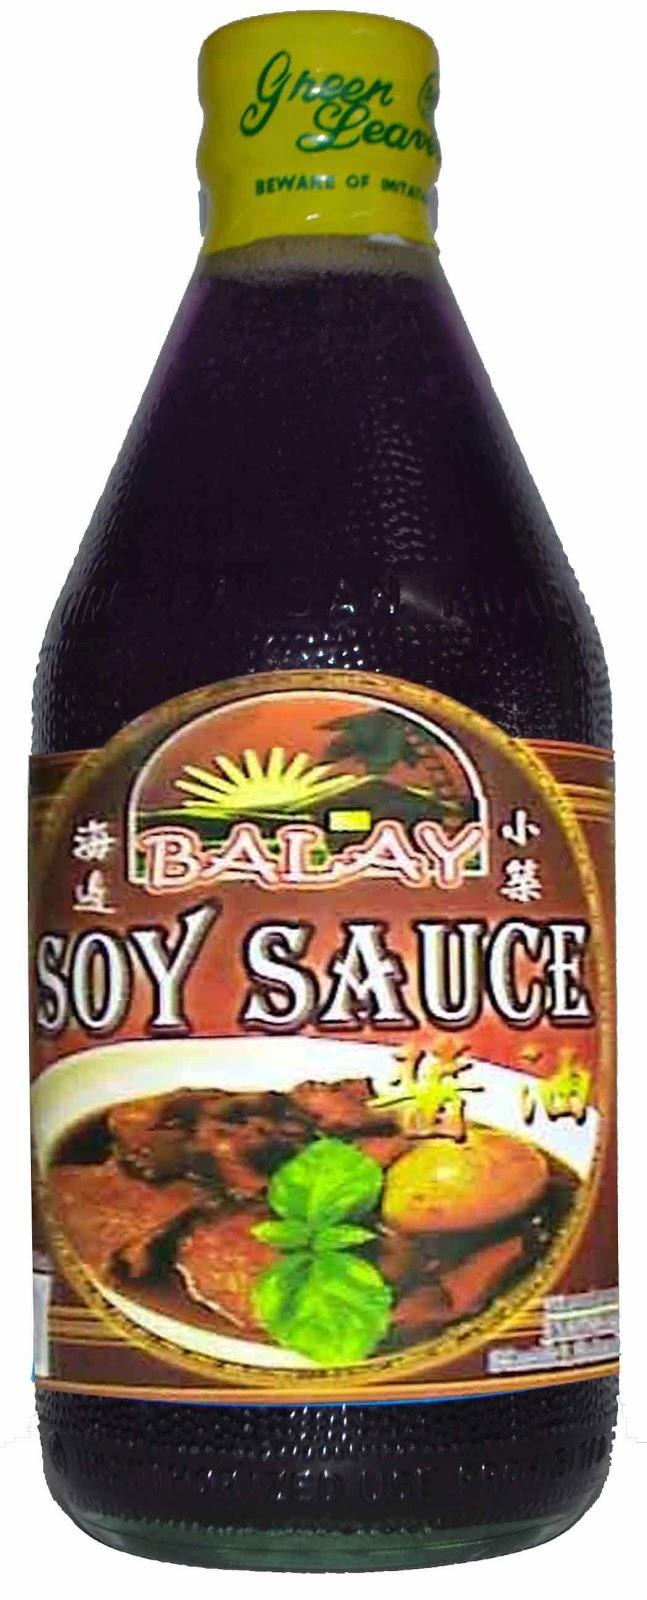 Balay soy sauce